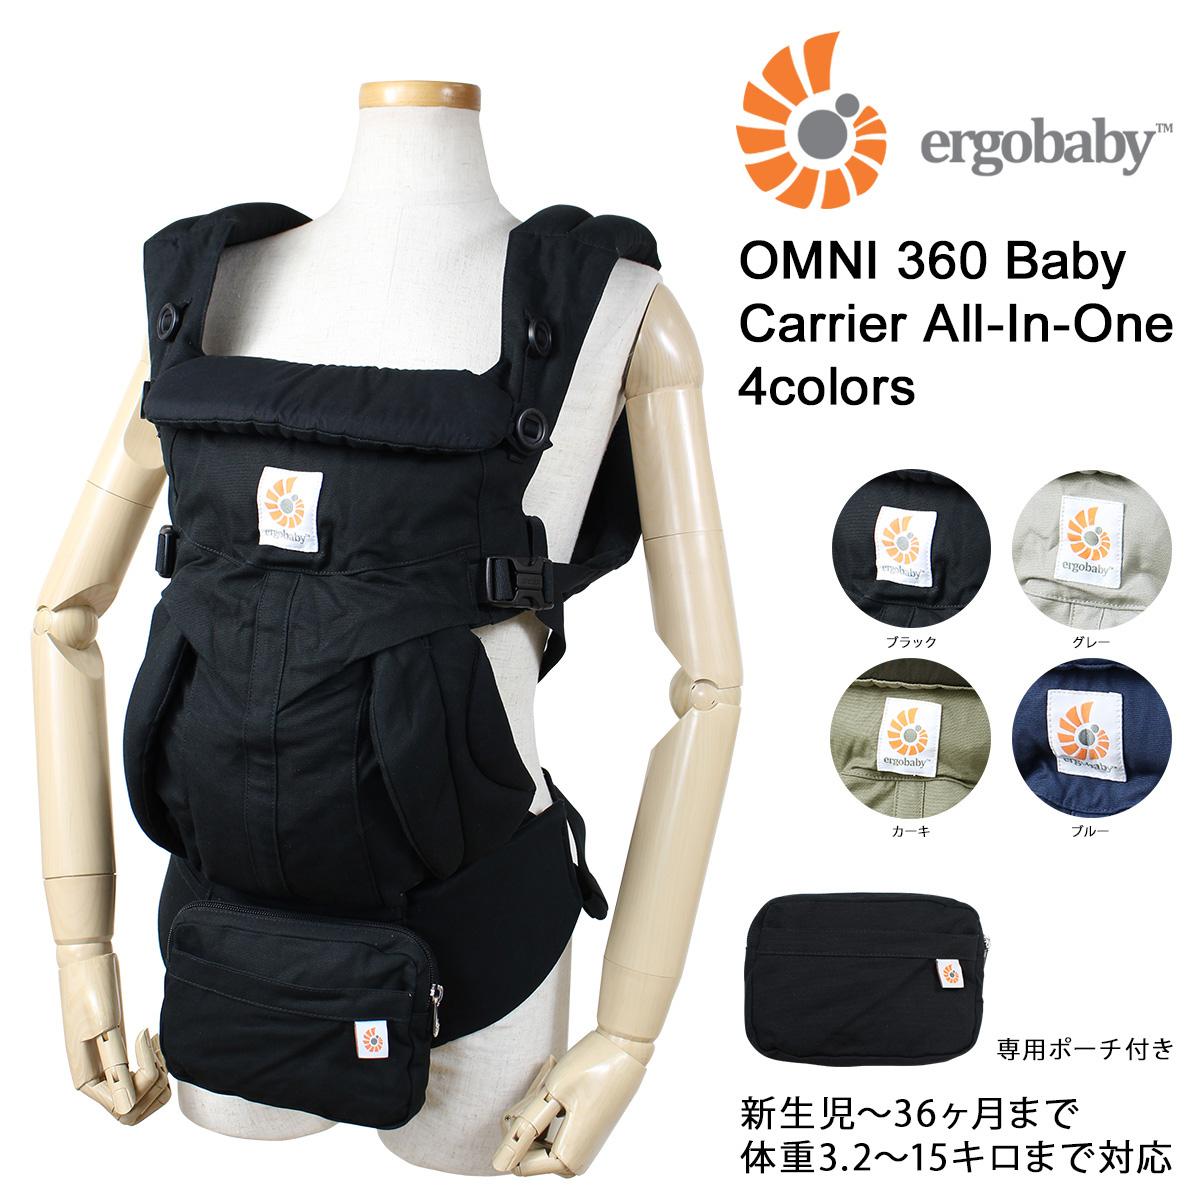 ERGOBABY OMNI 360 BABY CARRIER ALL IN ONE エルゴベビー エルゴ オムニ360 抱っこ紐 ベビーキャリア 新生児